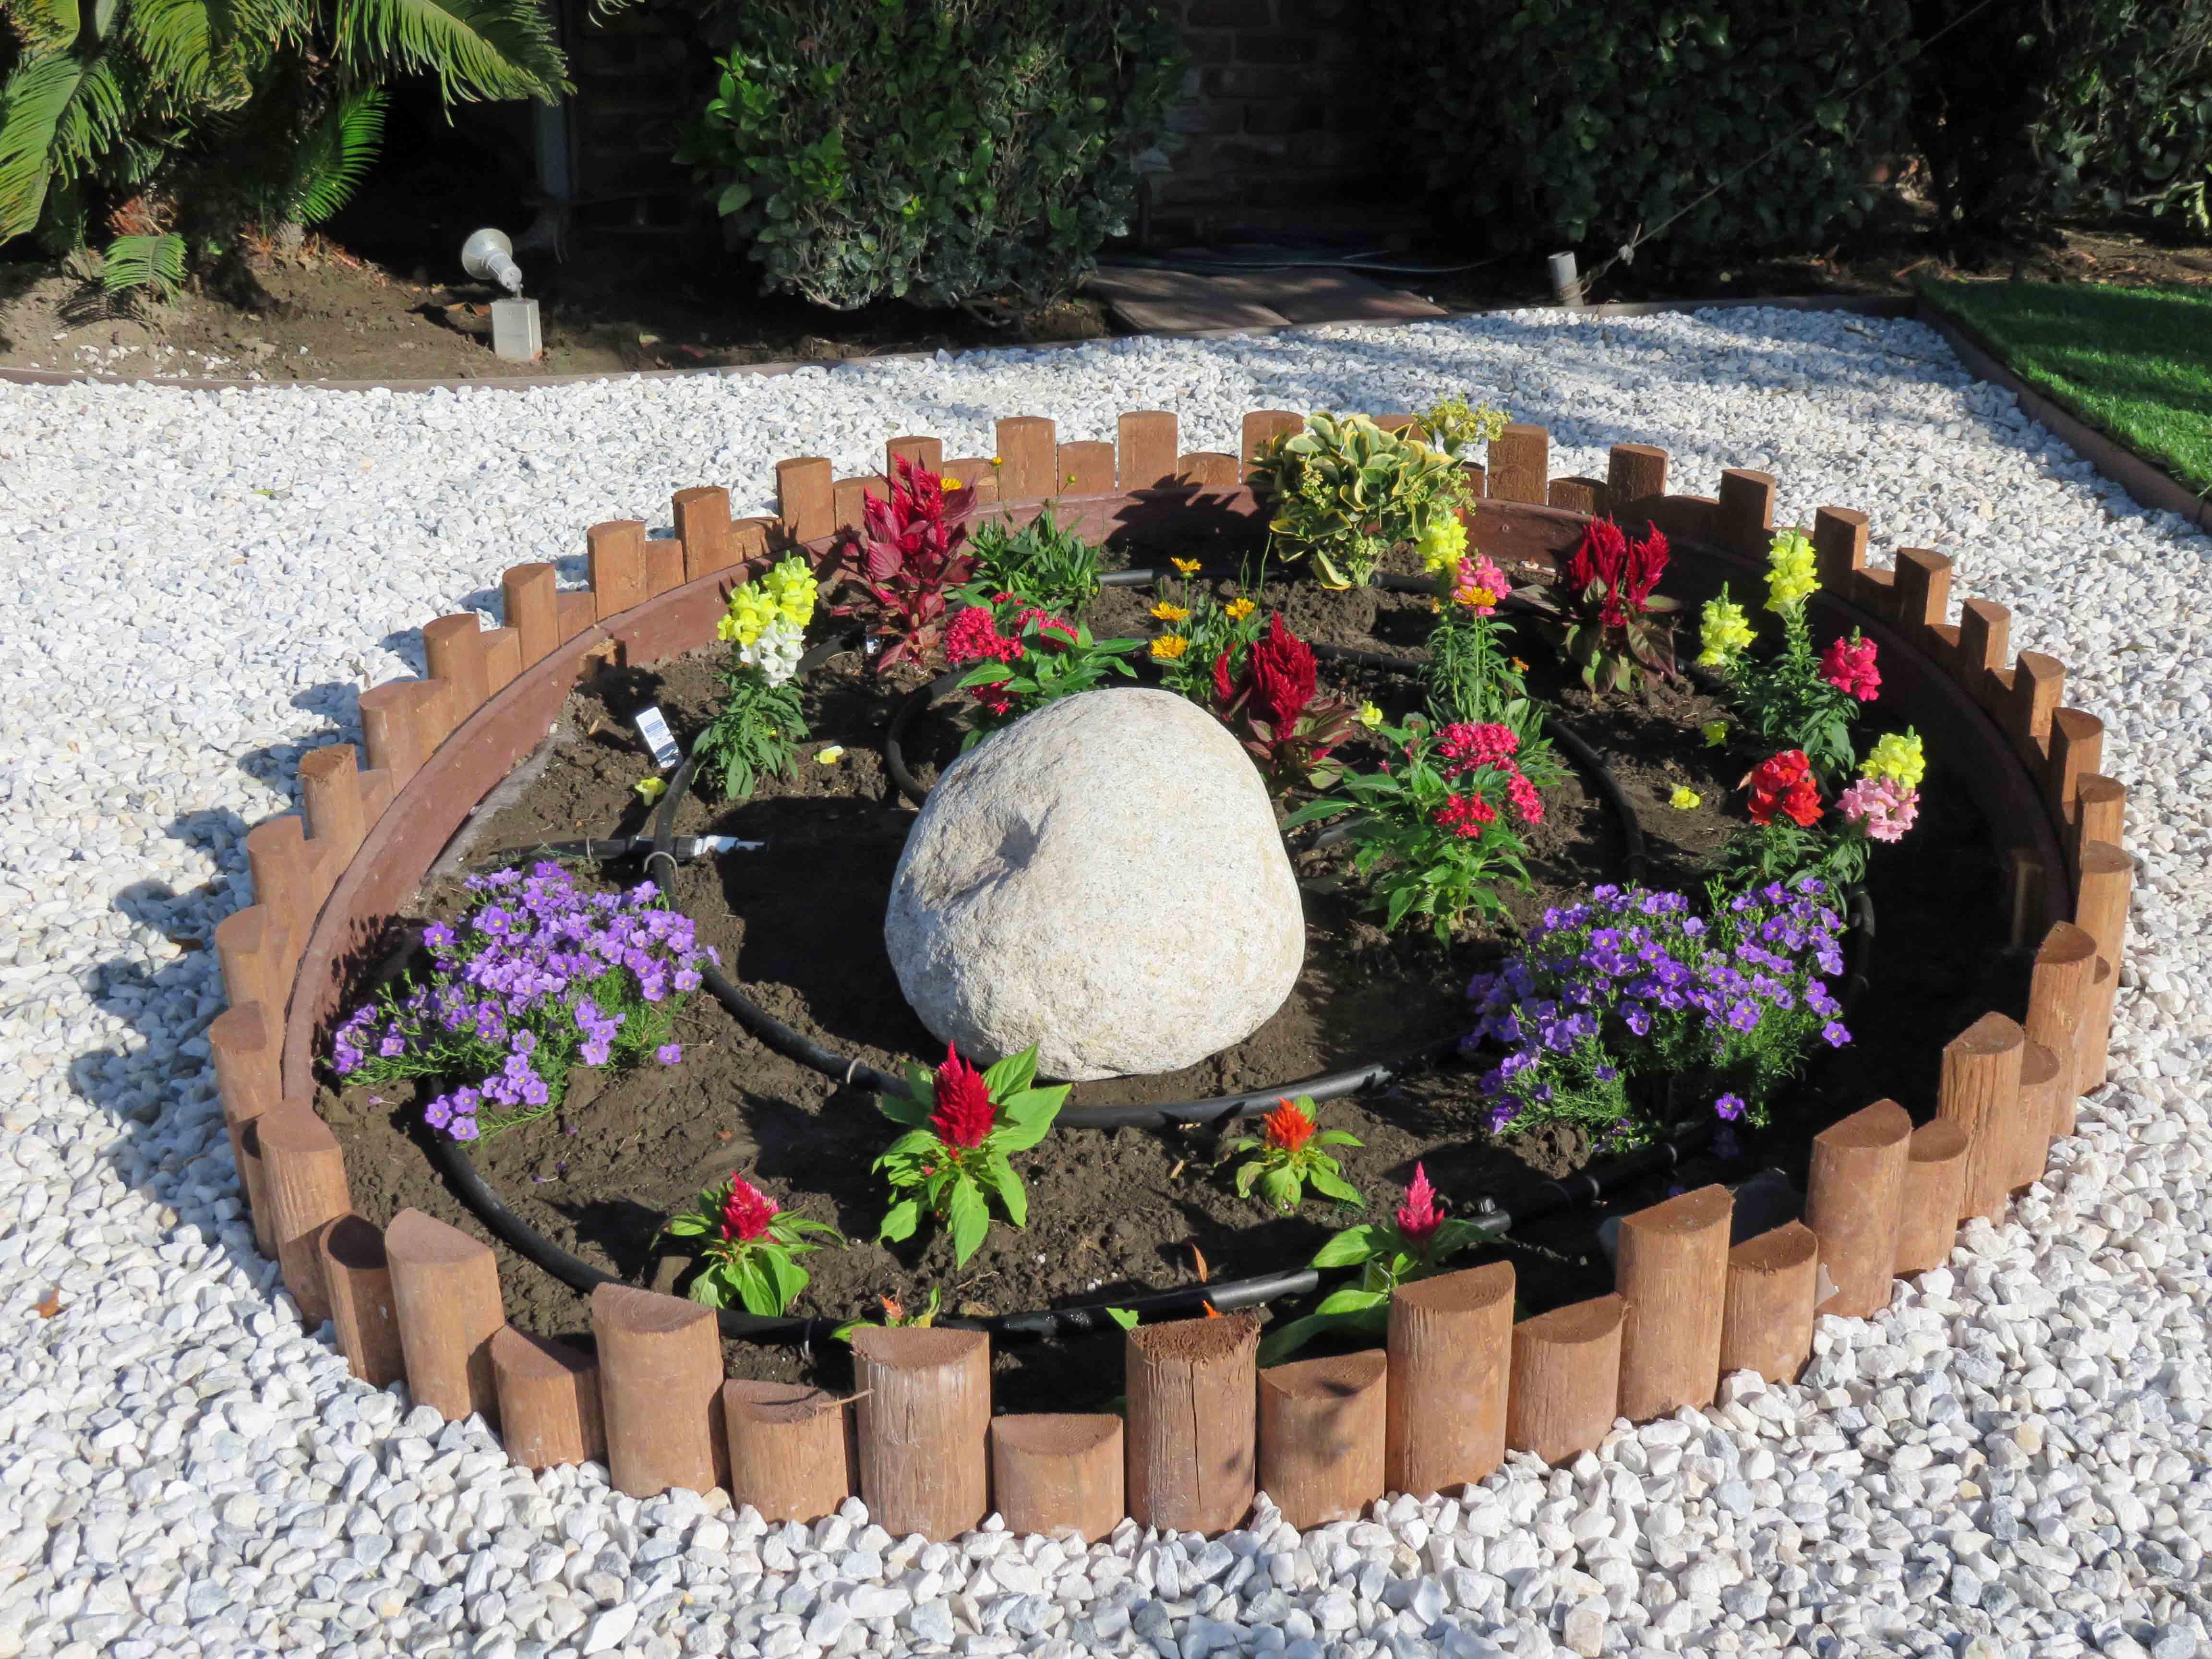 Drip Irrigation in flower bed